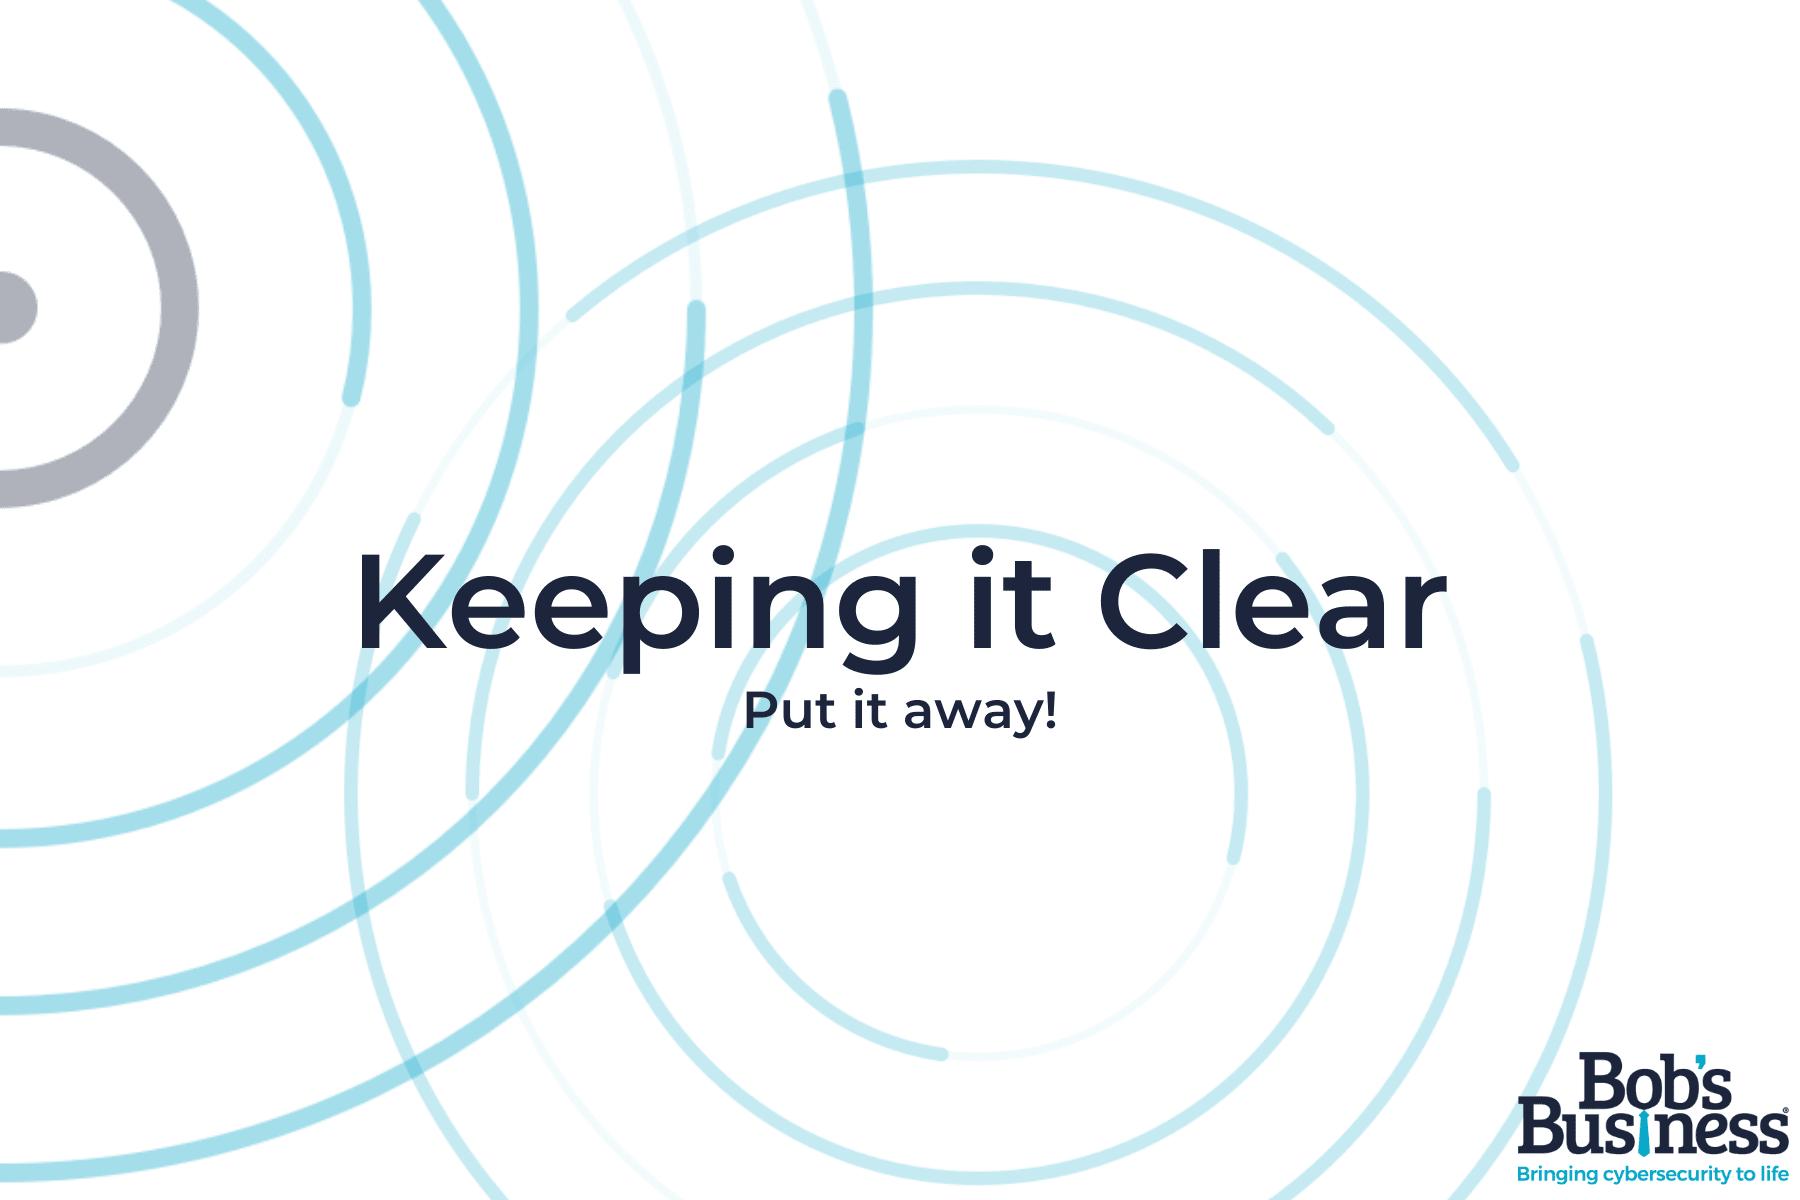 Keeping it Clear